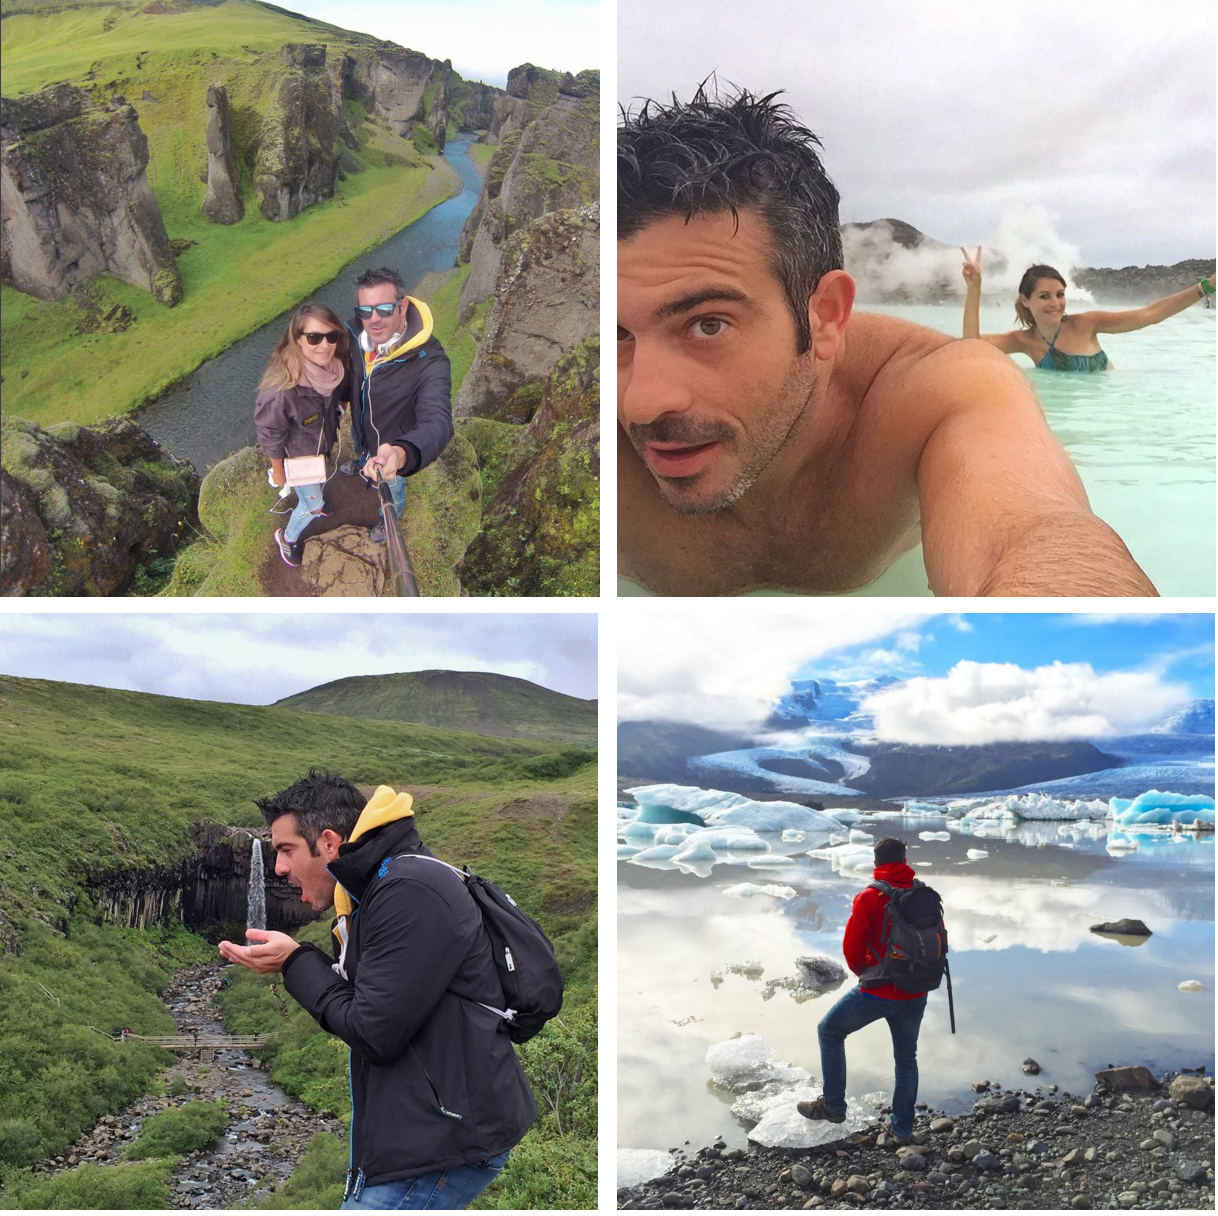 Islandia memoria de viajes 2015 - 23838501360 125404ee6a o - Memoria de Viajes 2015